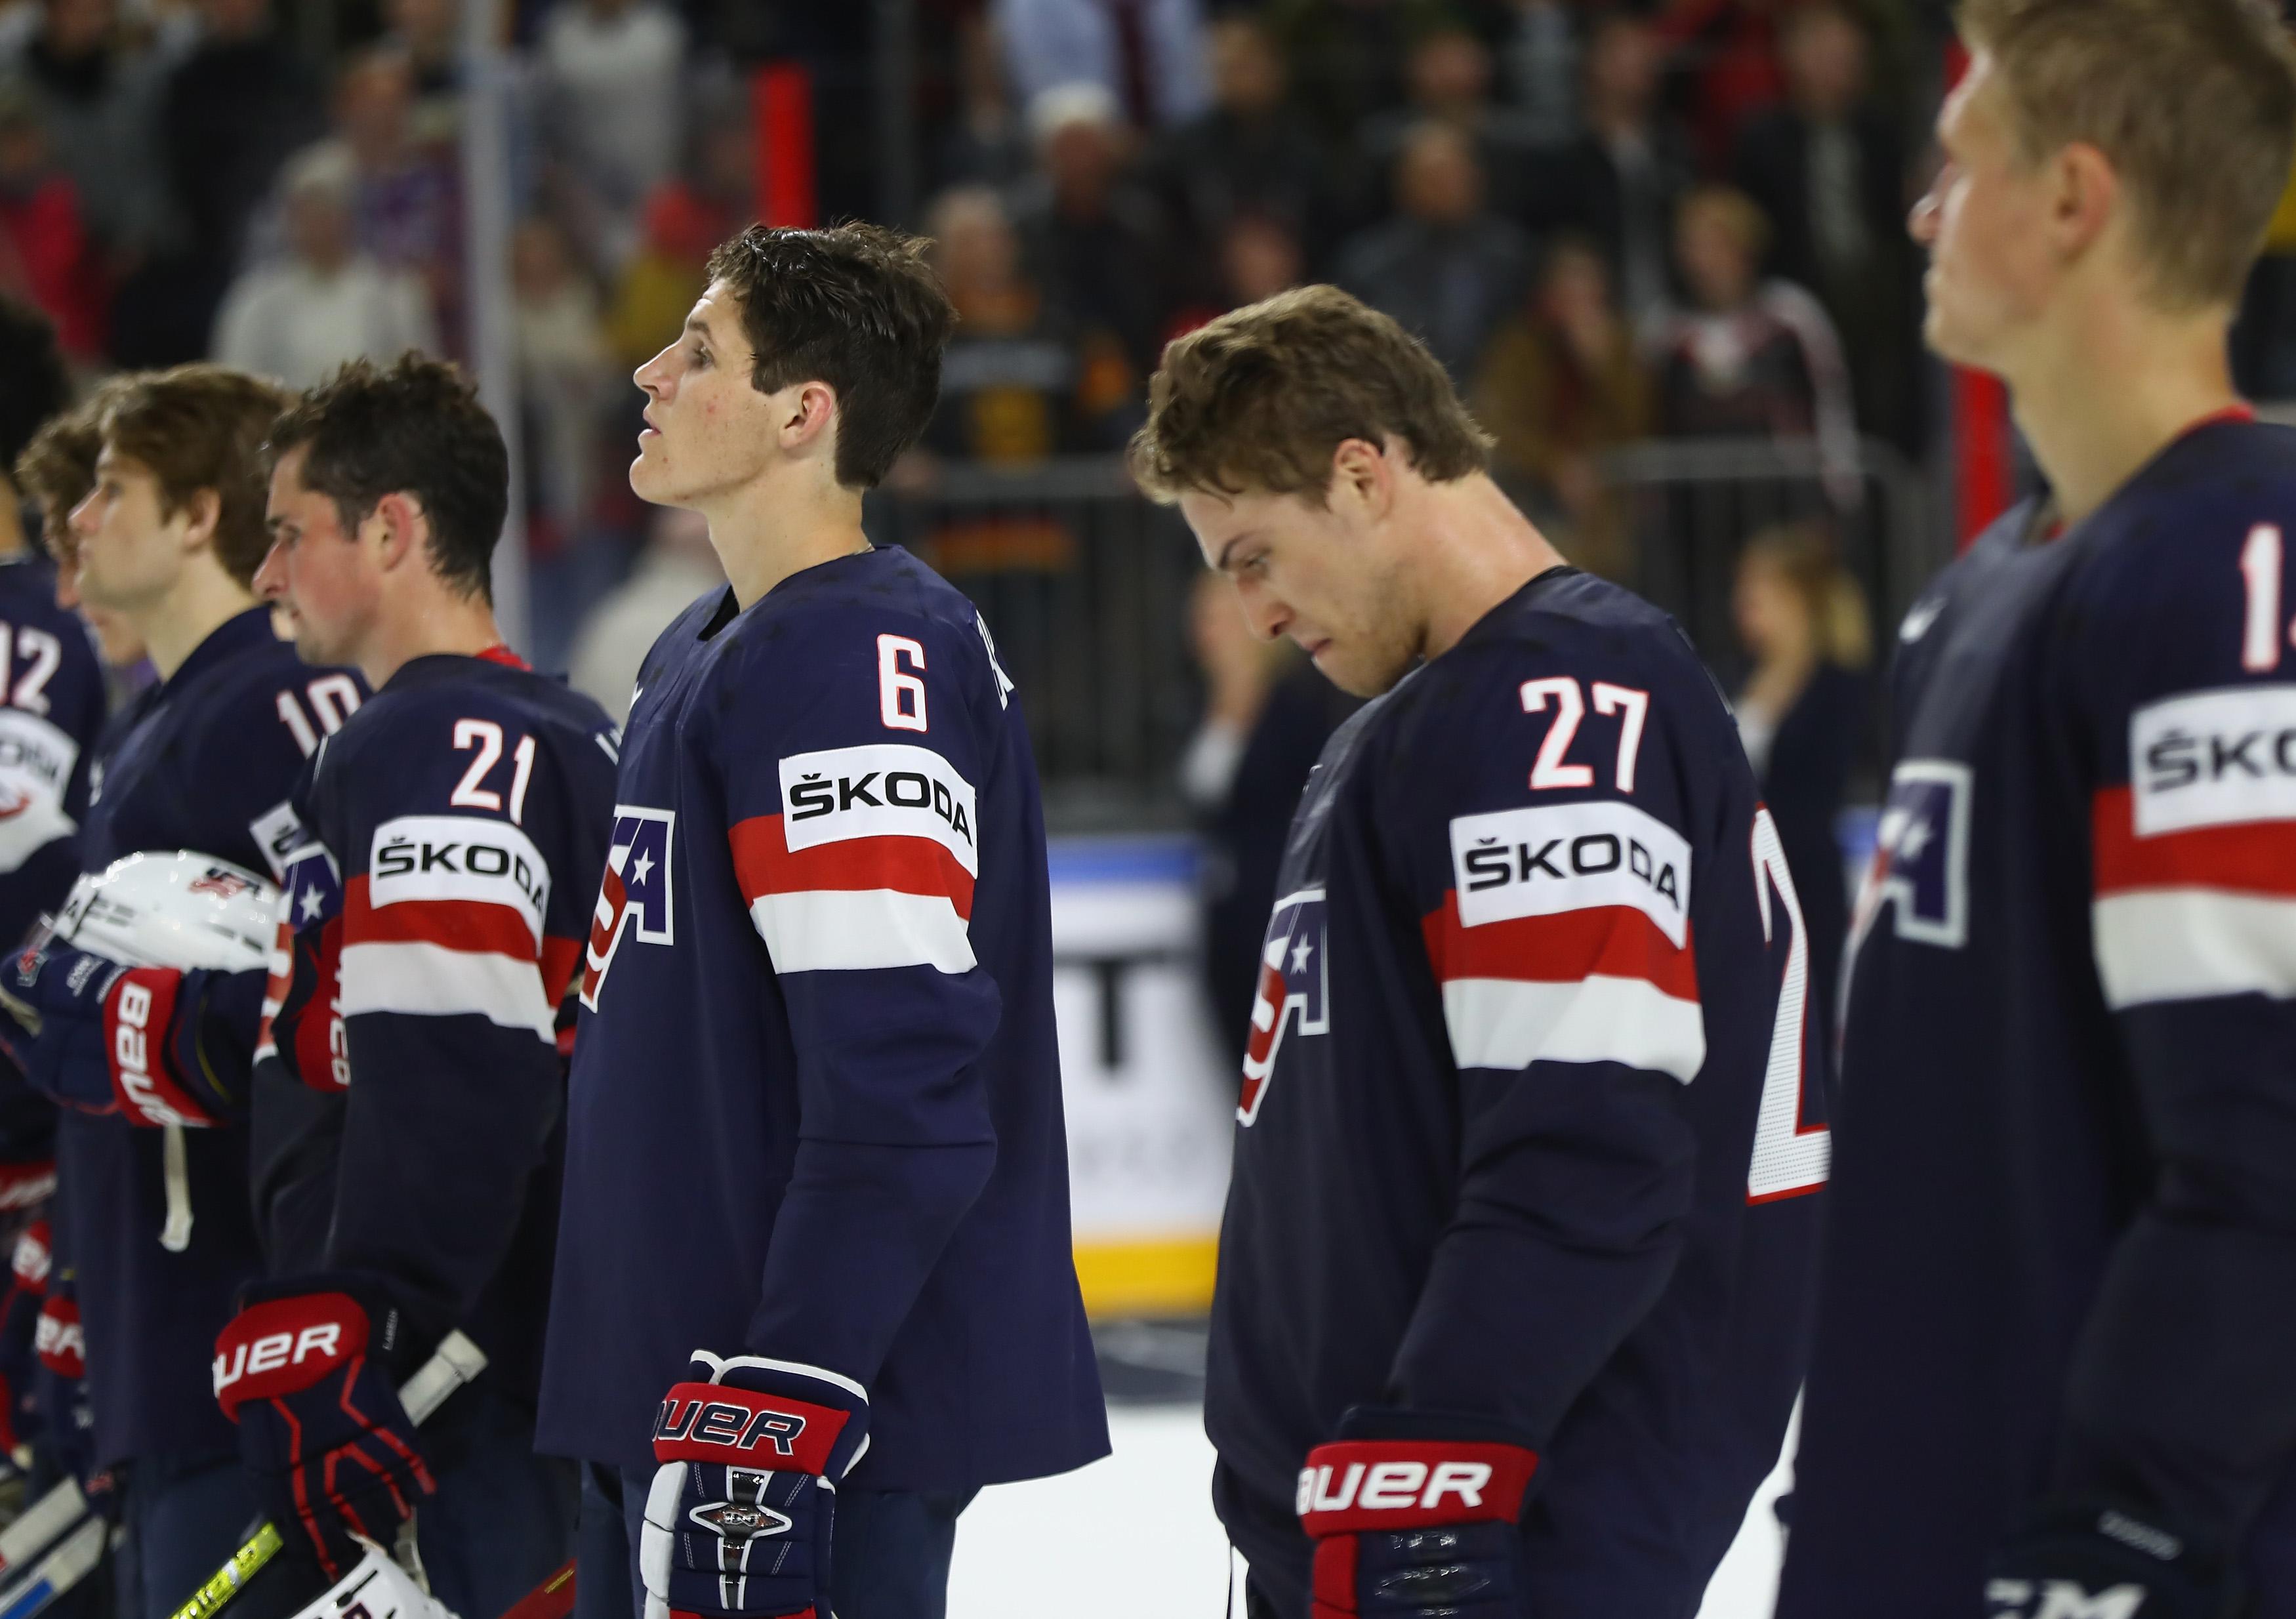 USA v Germany - 2017 IIHF Ice Hockey World Championship